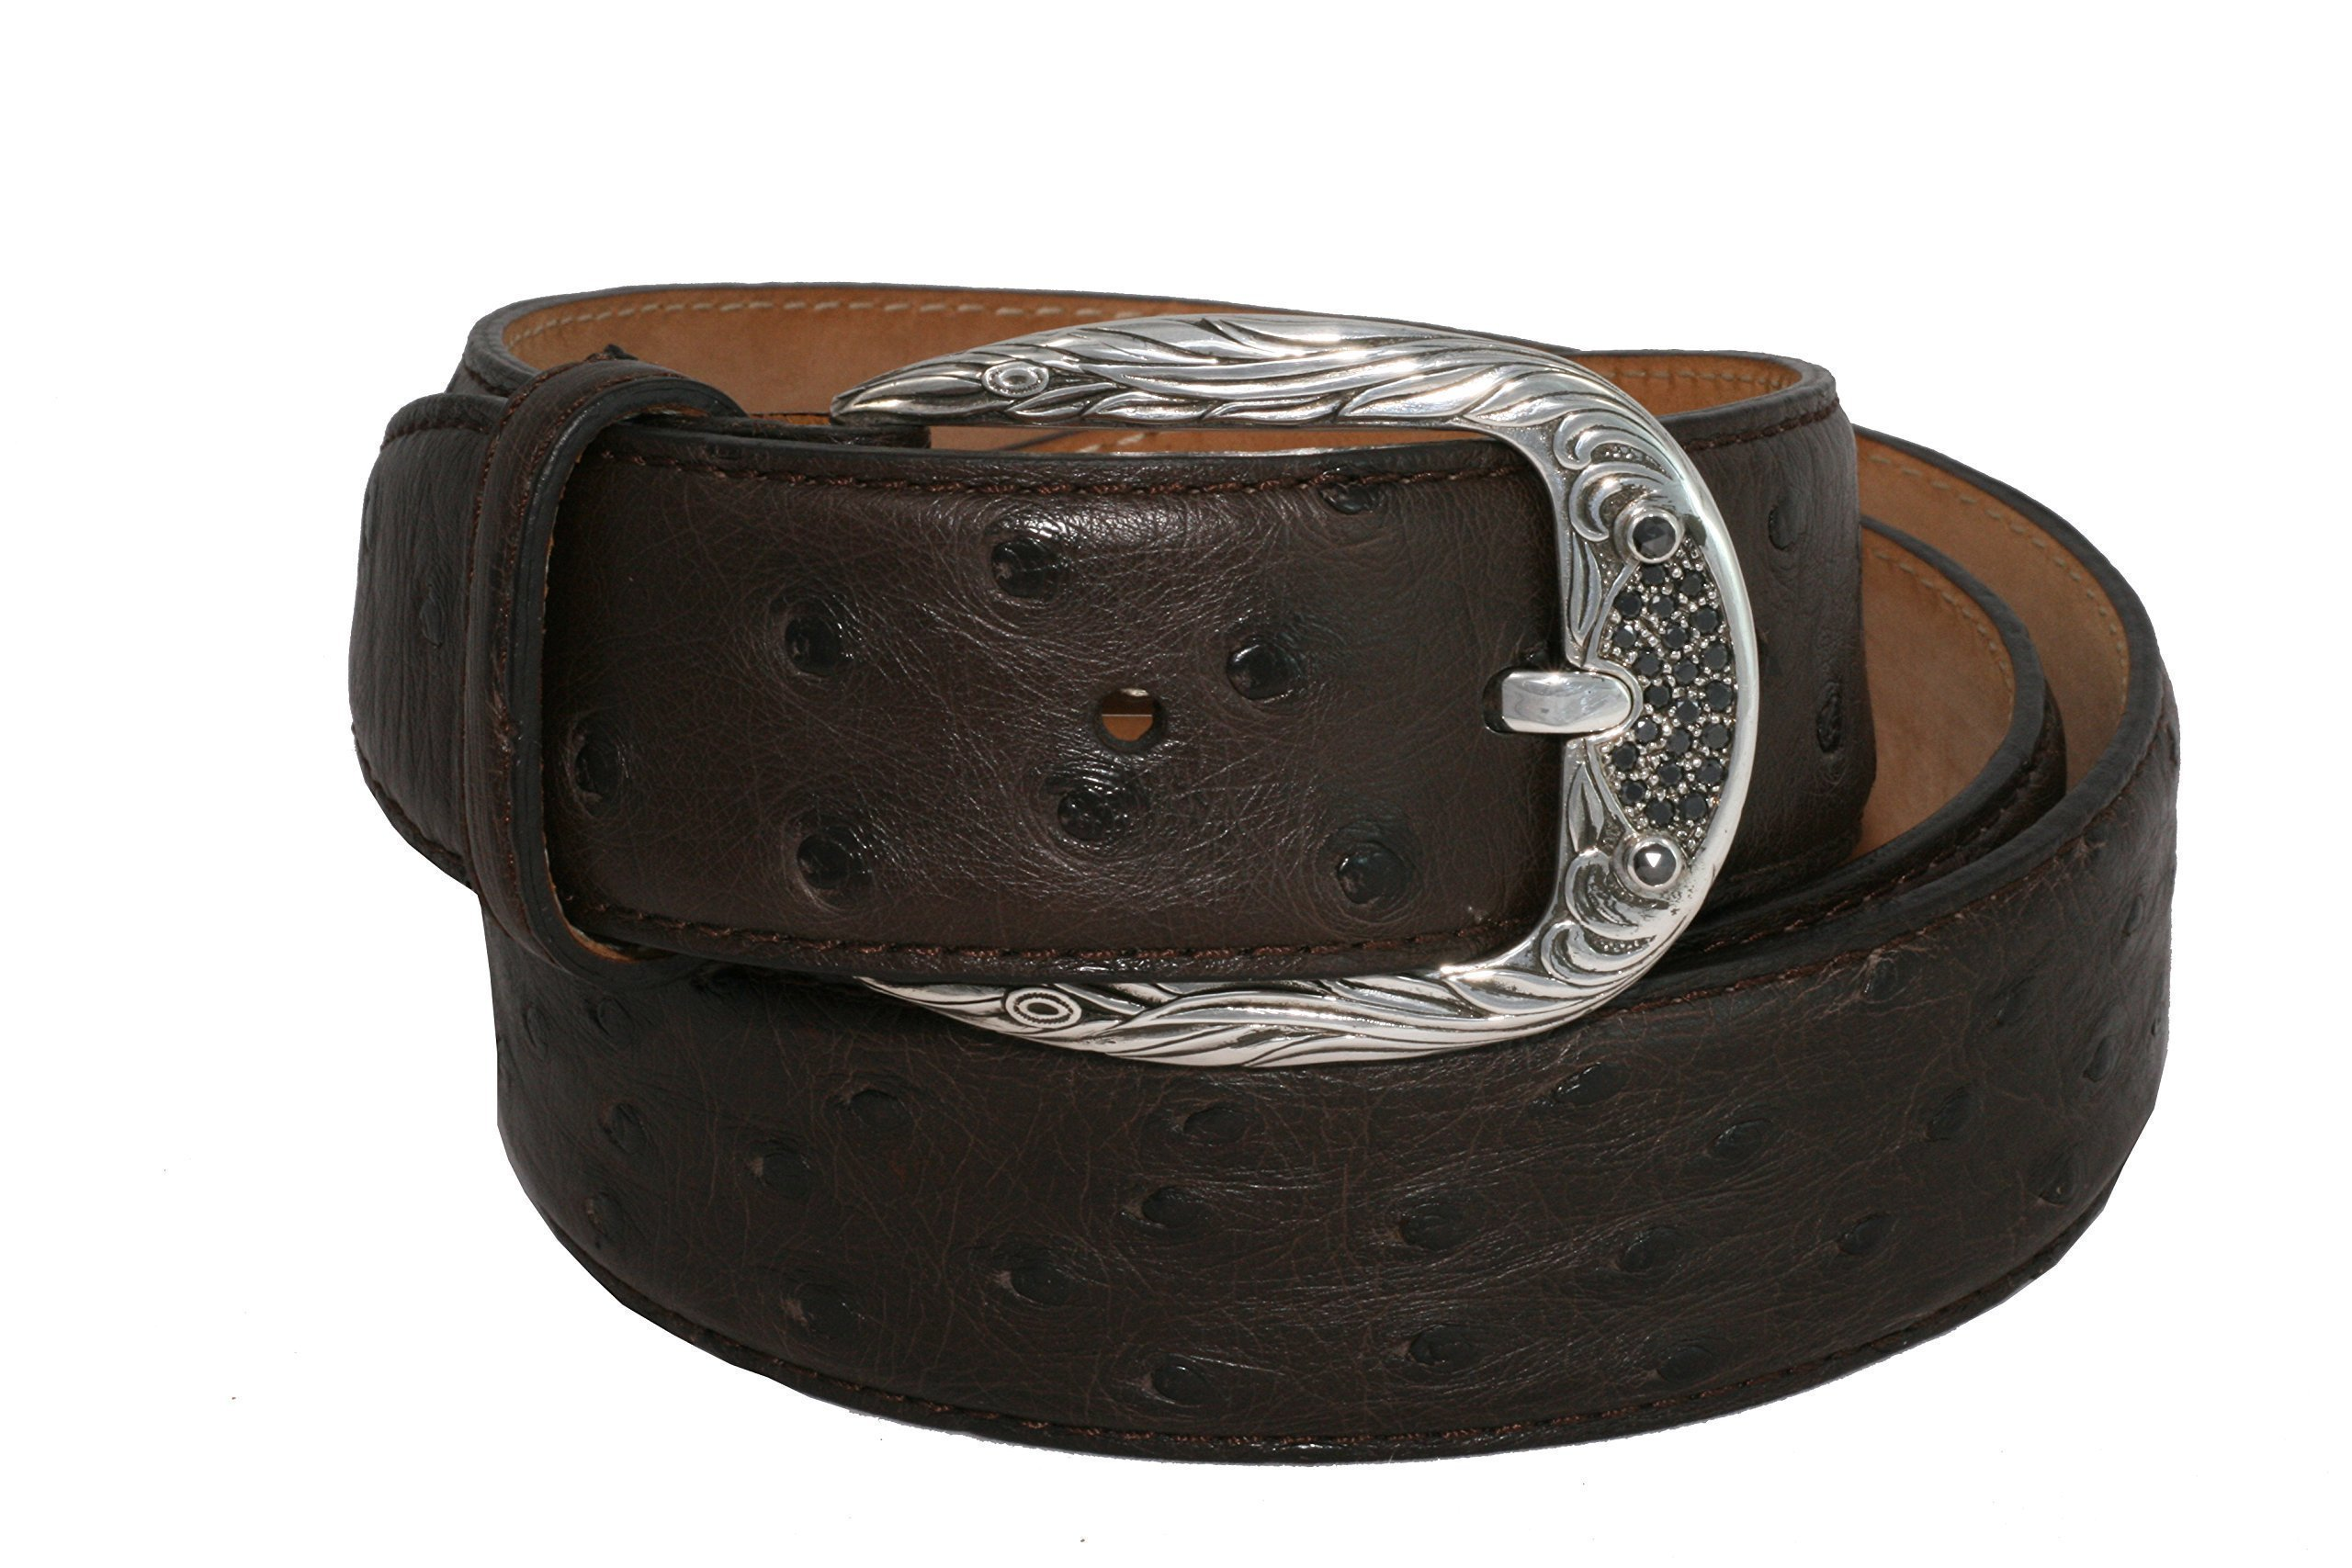 Belt by Urso Luxury buckle in Sterling silver and black Diamonds in Ostrich Skin by Urso Luxury